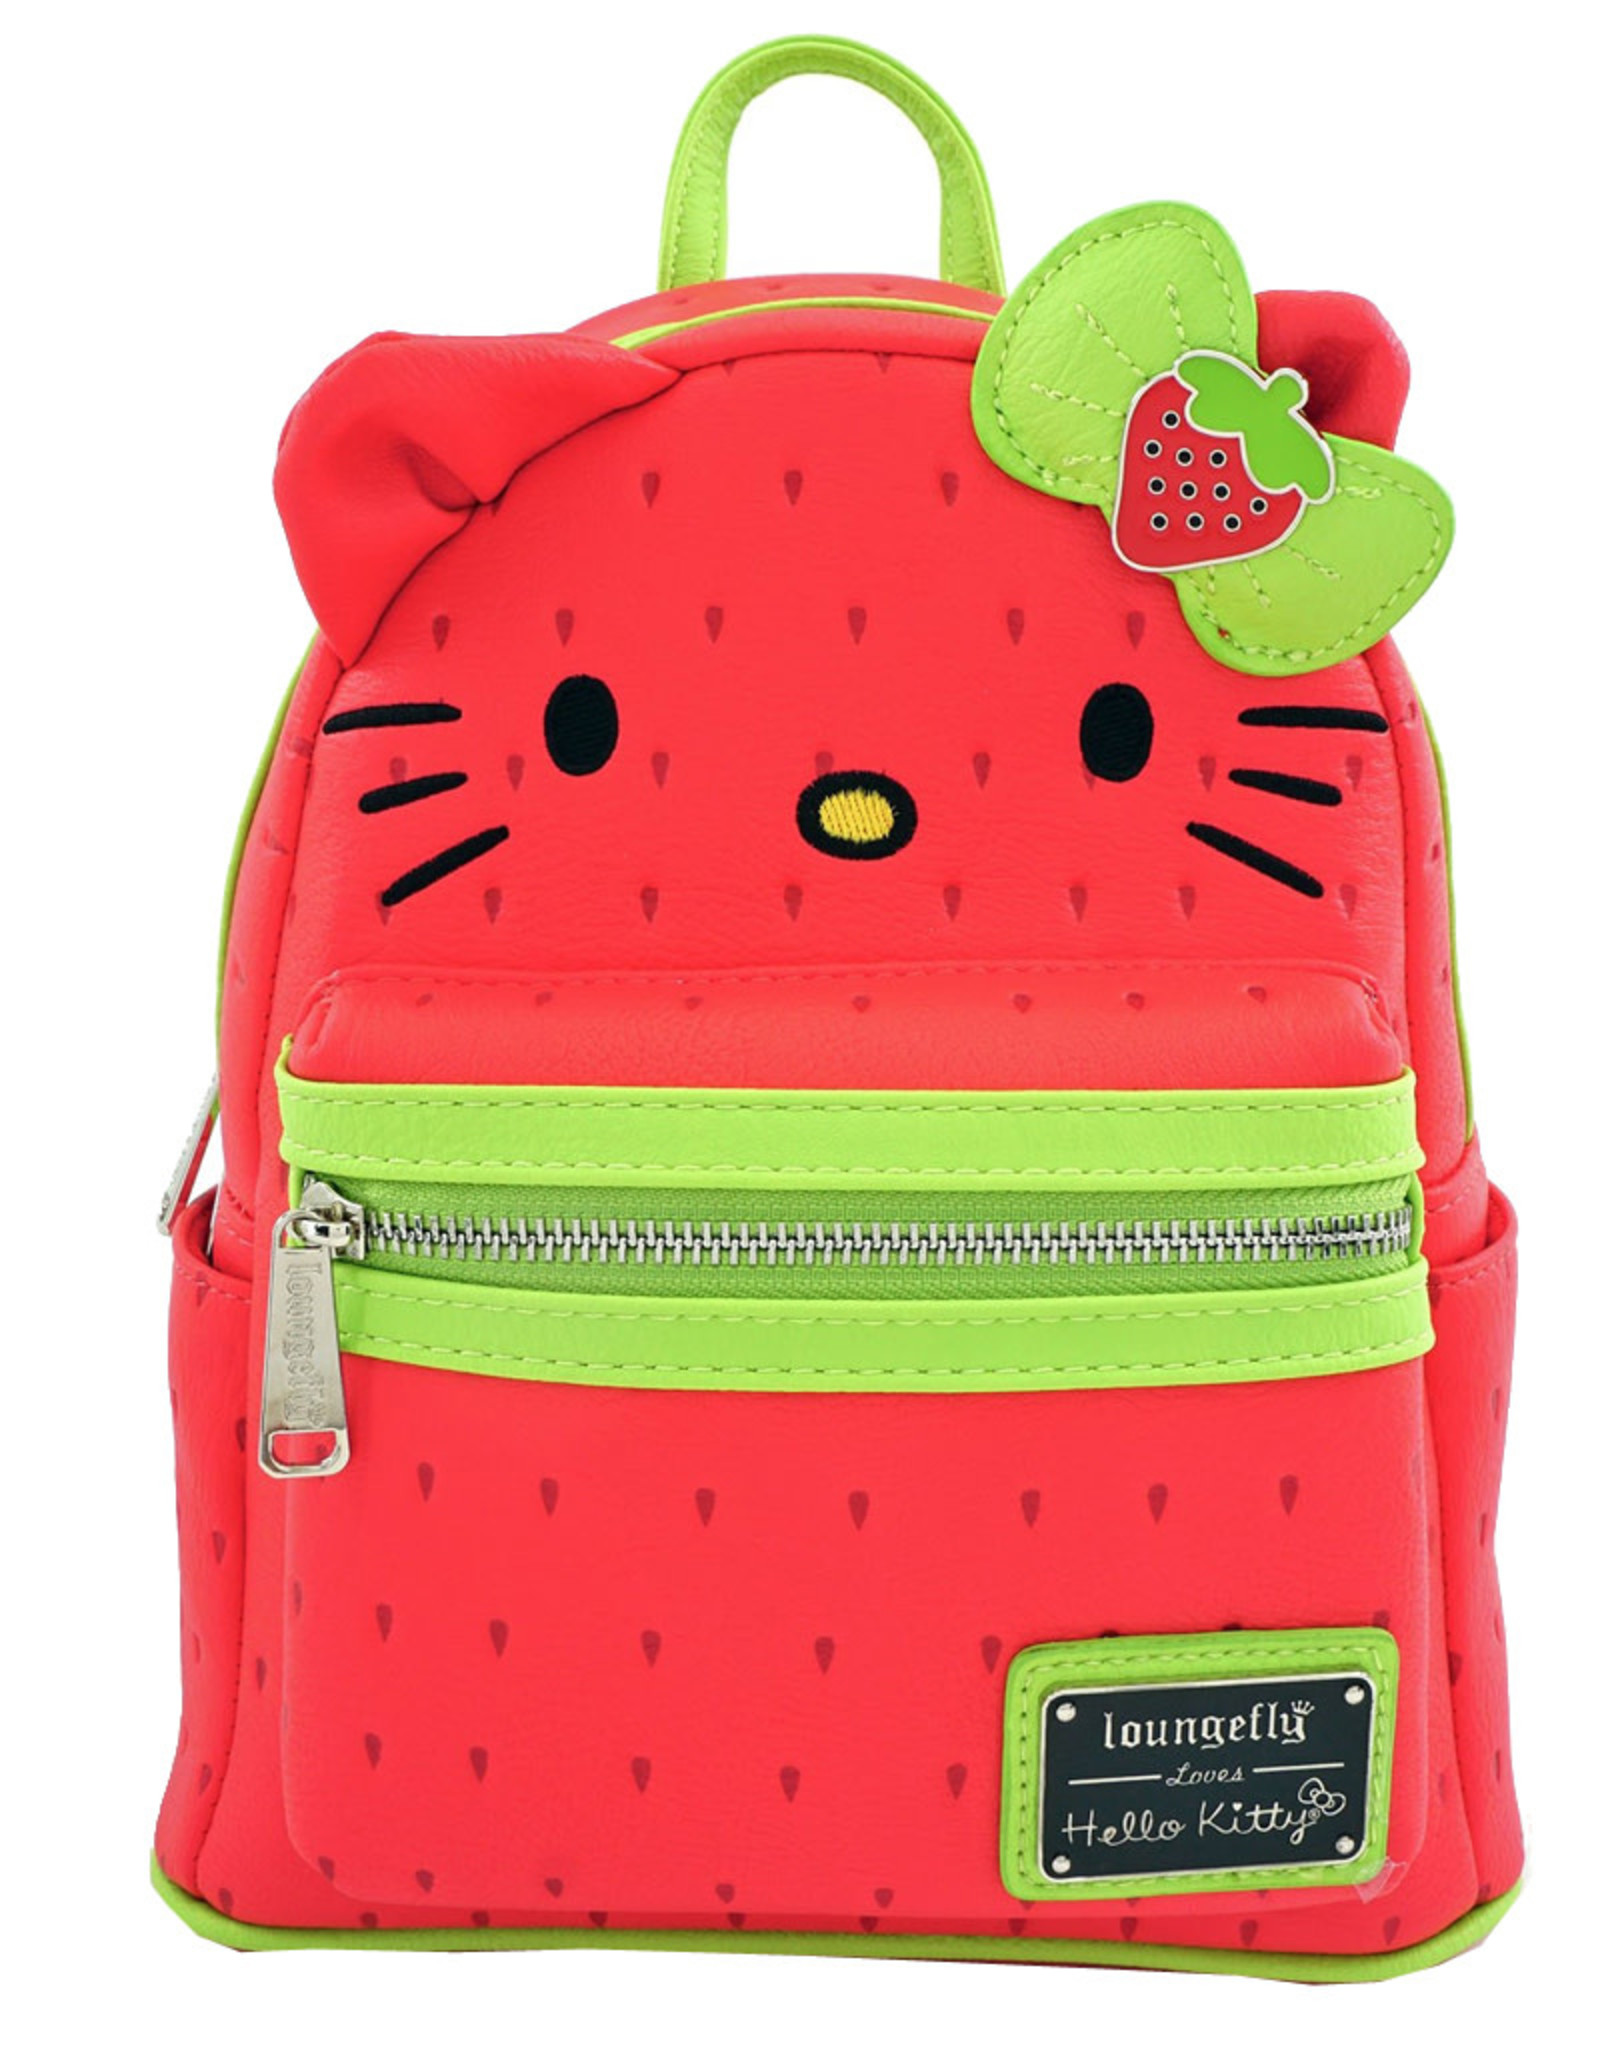 Hello Kitty ( Loungefly Mini Backpack ) Strawberry